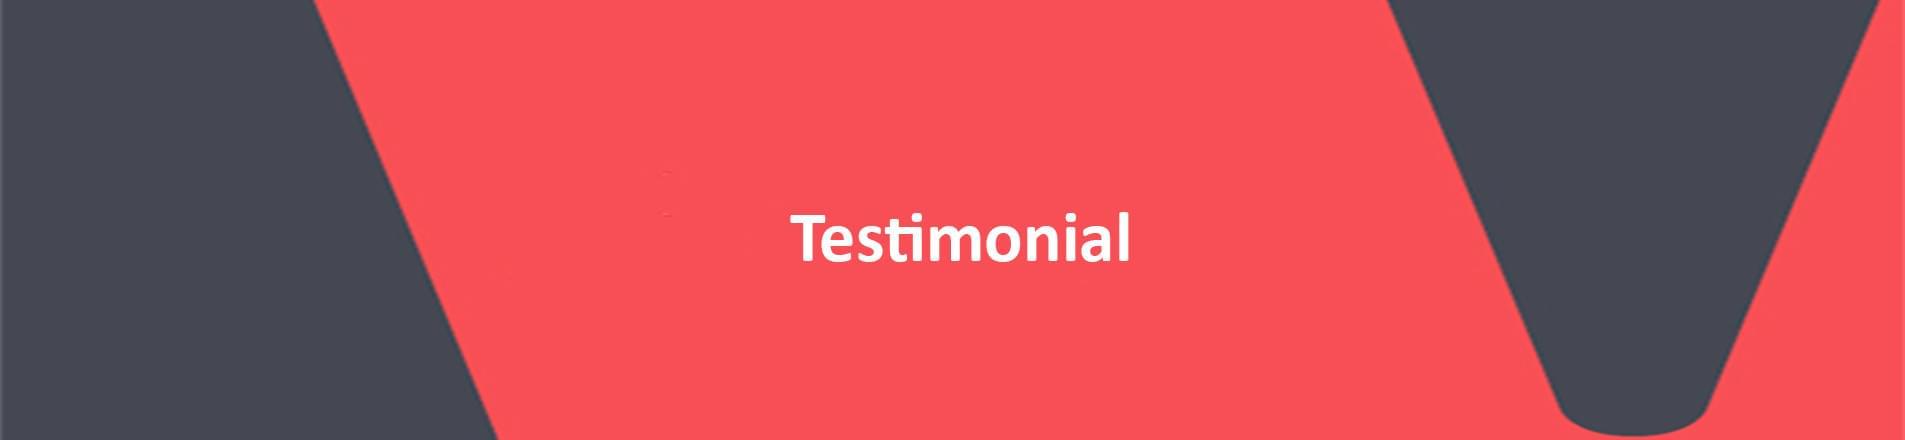 Image of the word testimonial